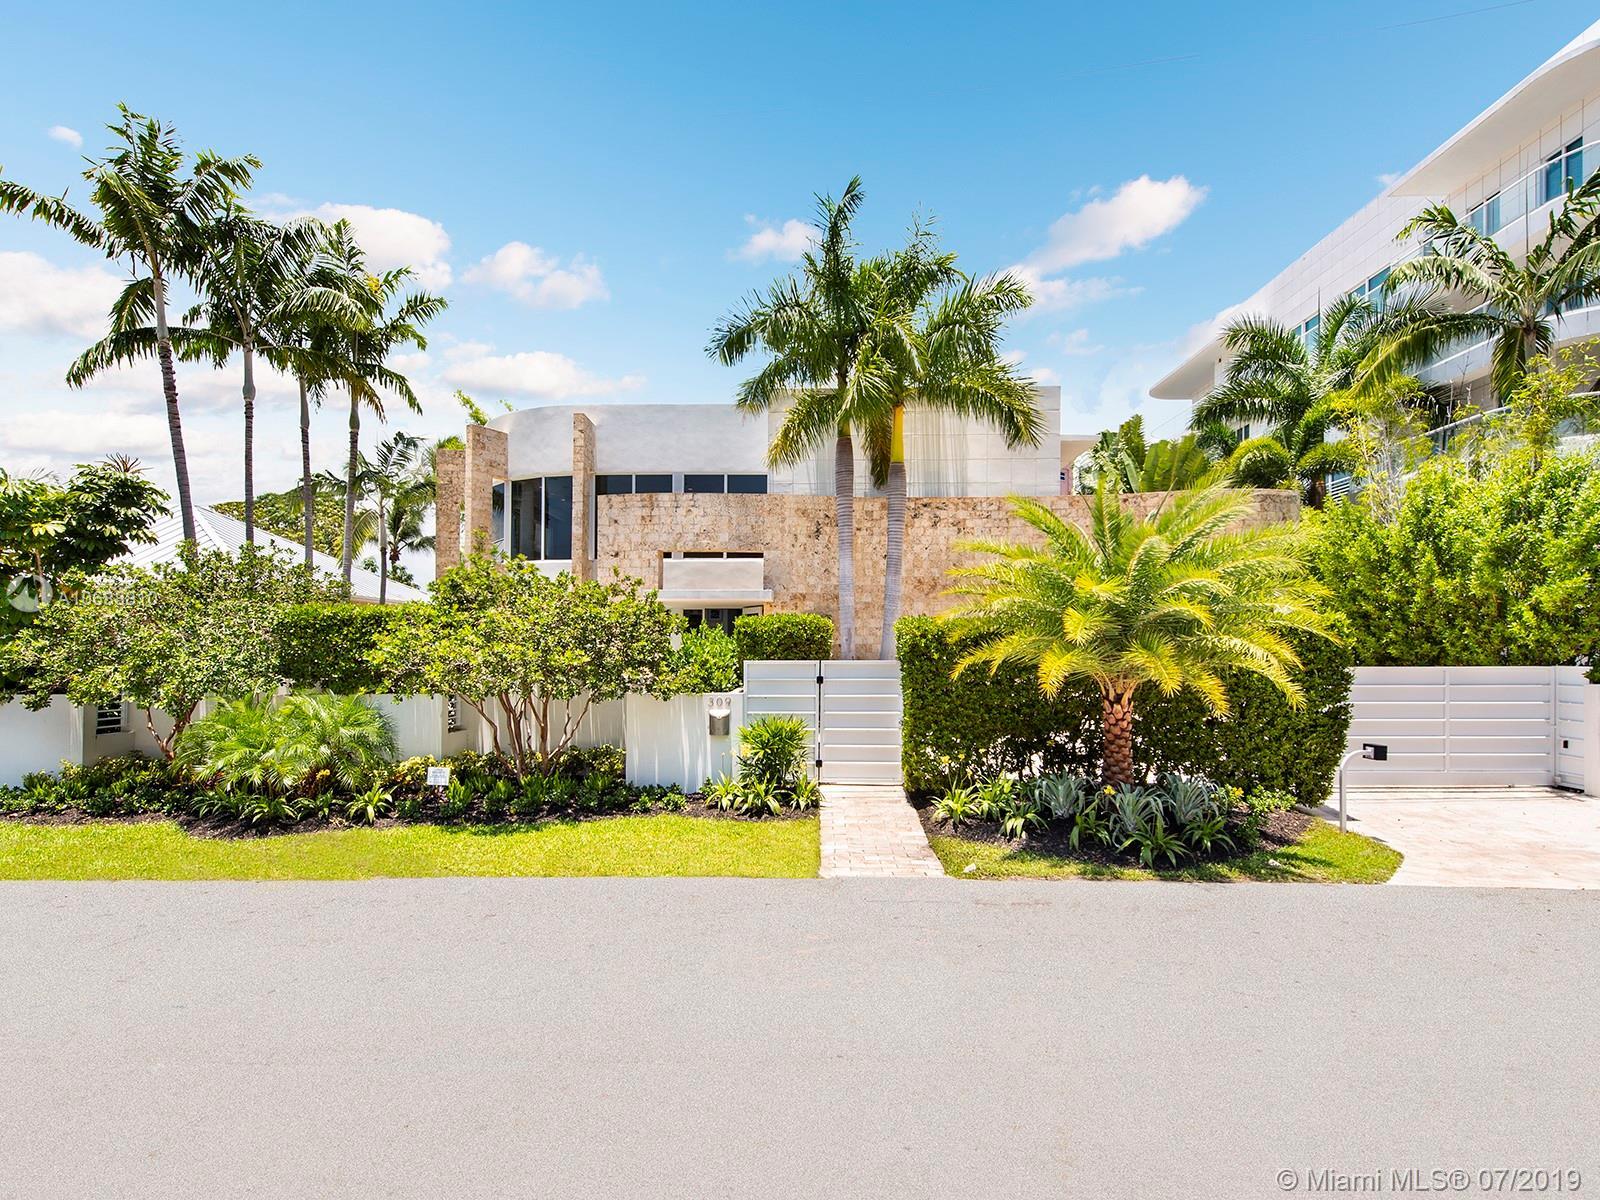 309 Bontona Ave, Fort Lauderdale, FL 33301